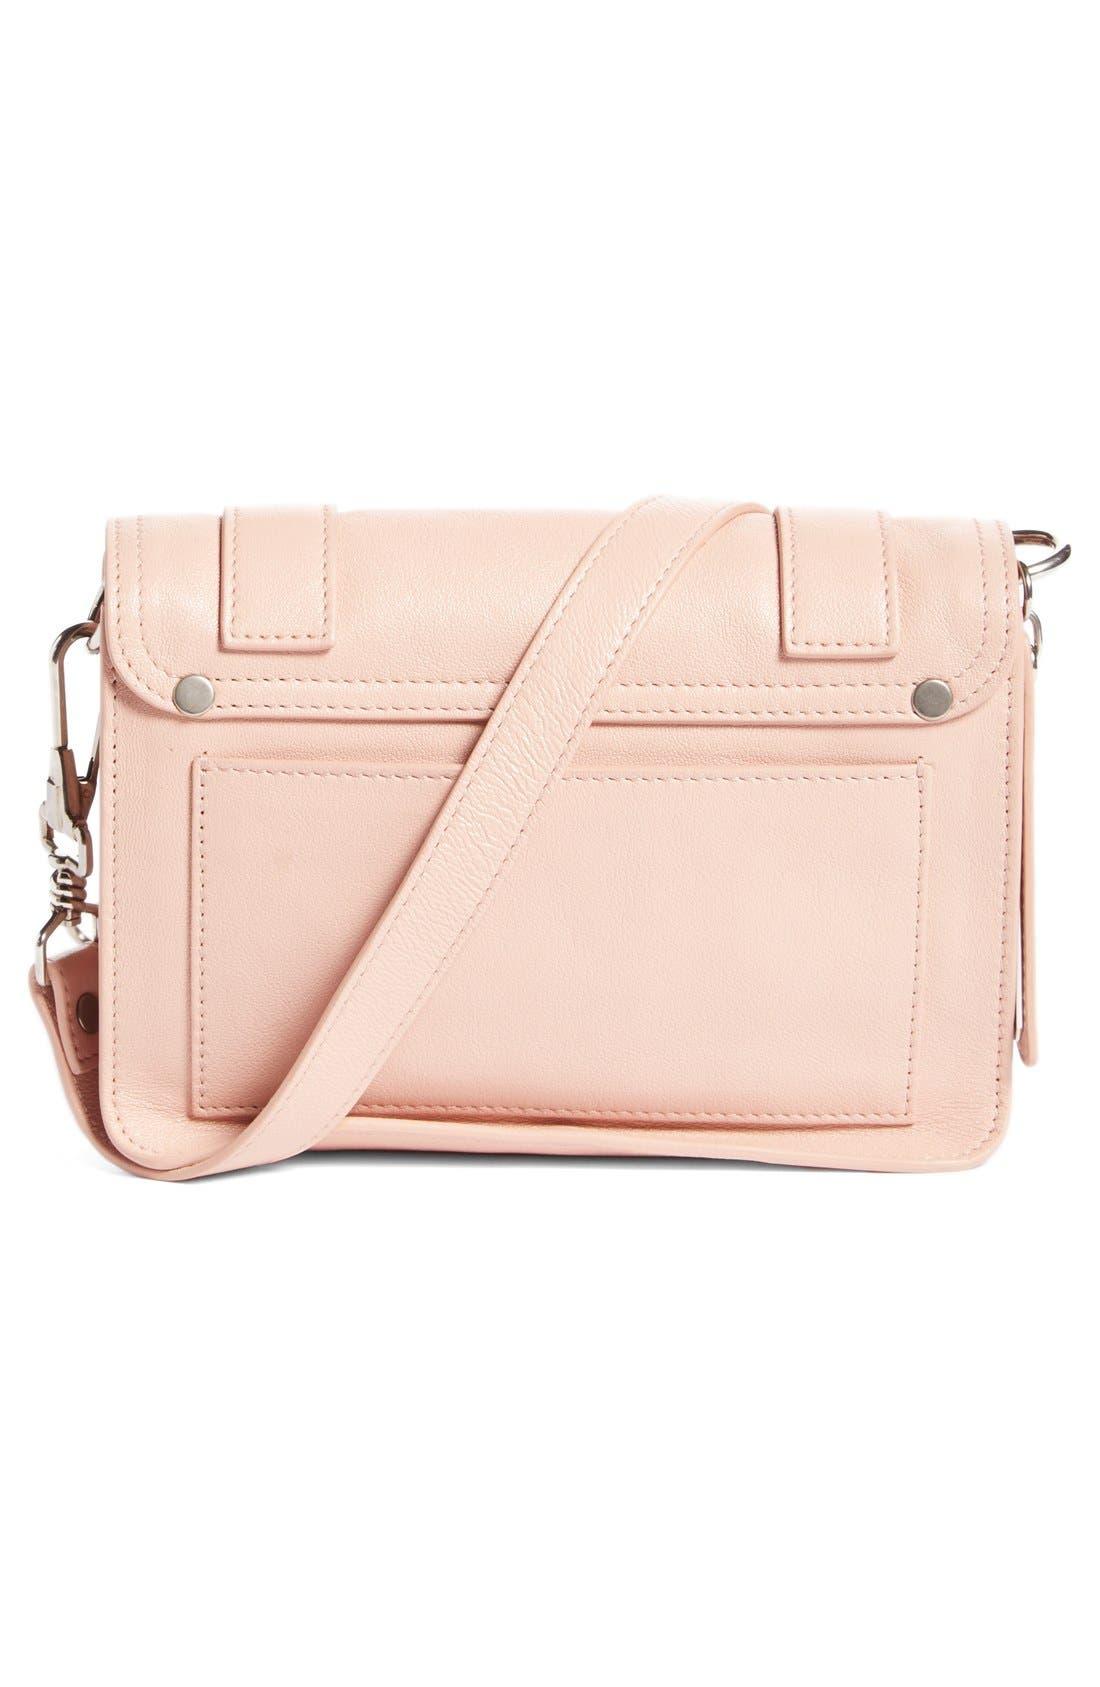 'Mini PS1' Lambskin Leather Crossbody Bag,                             Alternate thumbnail 5, color,